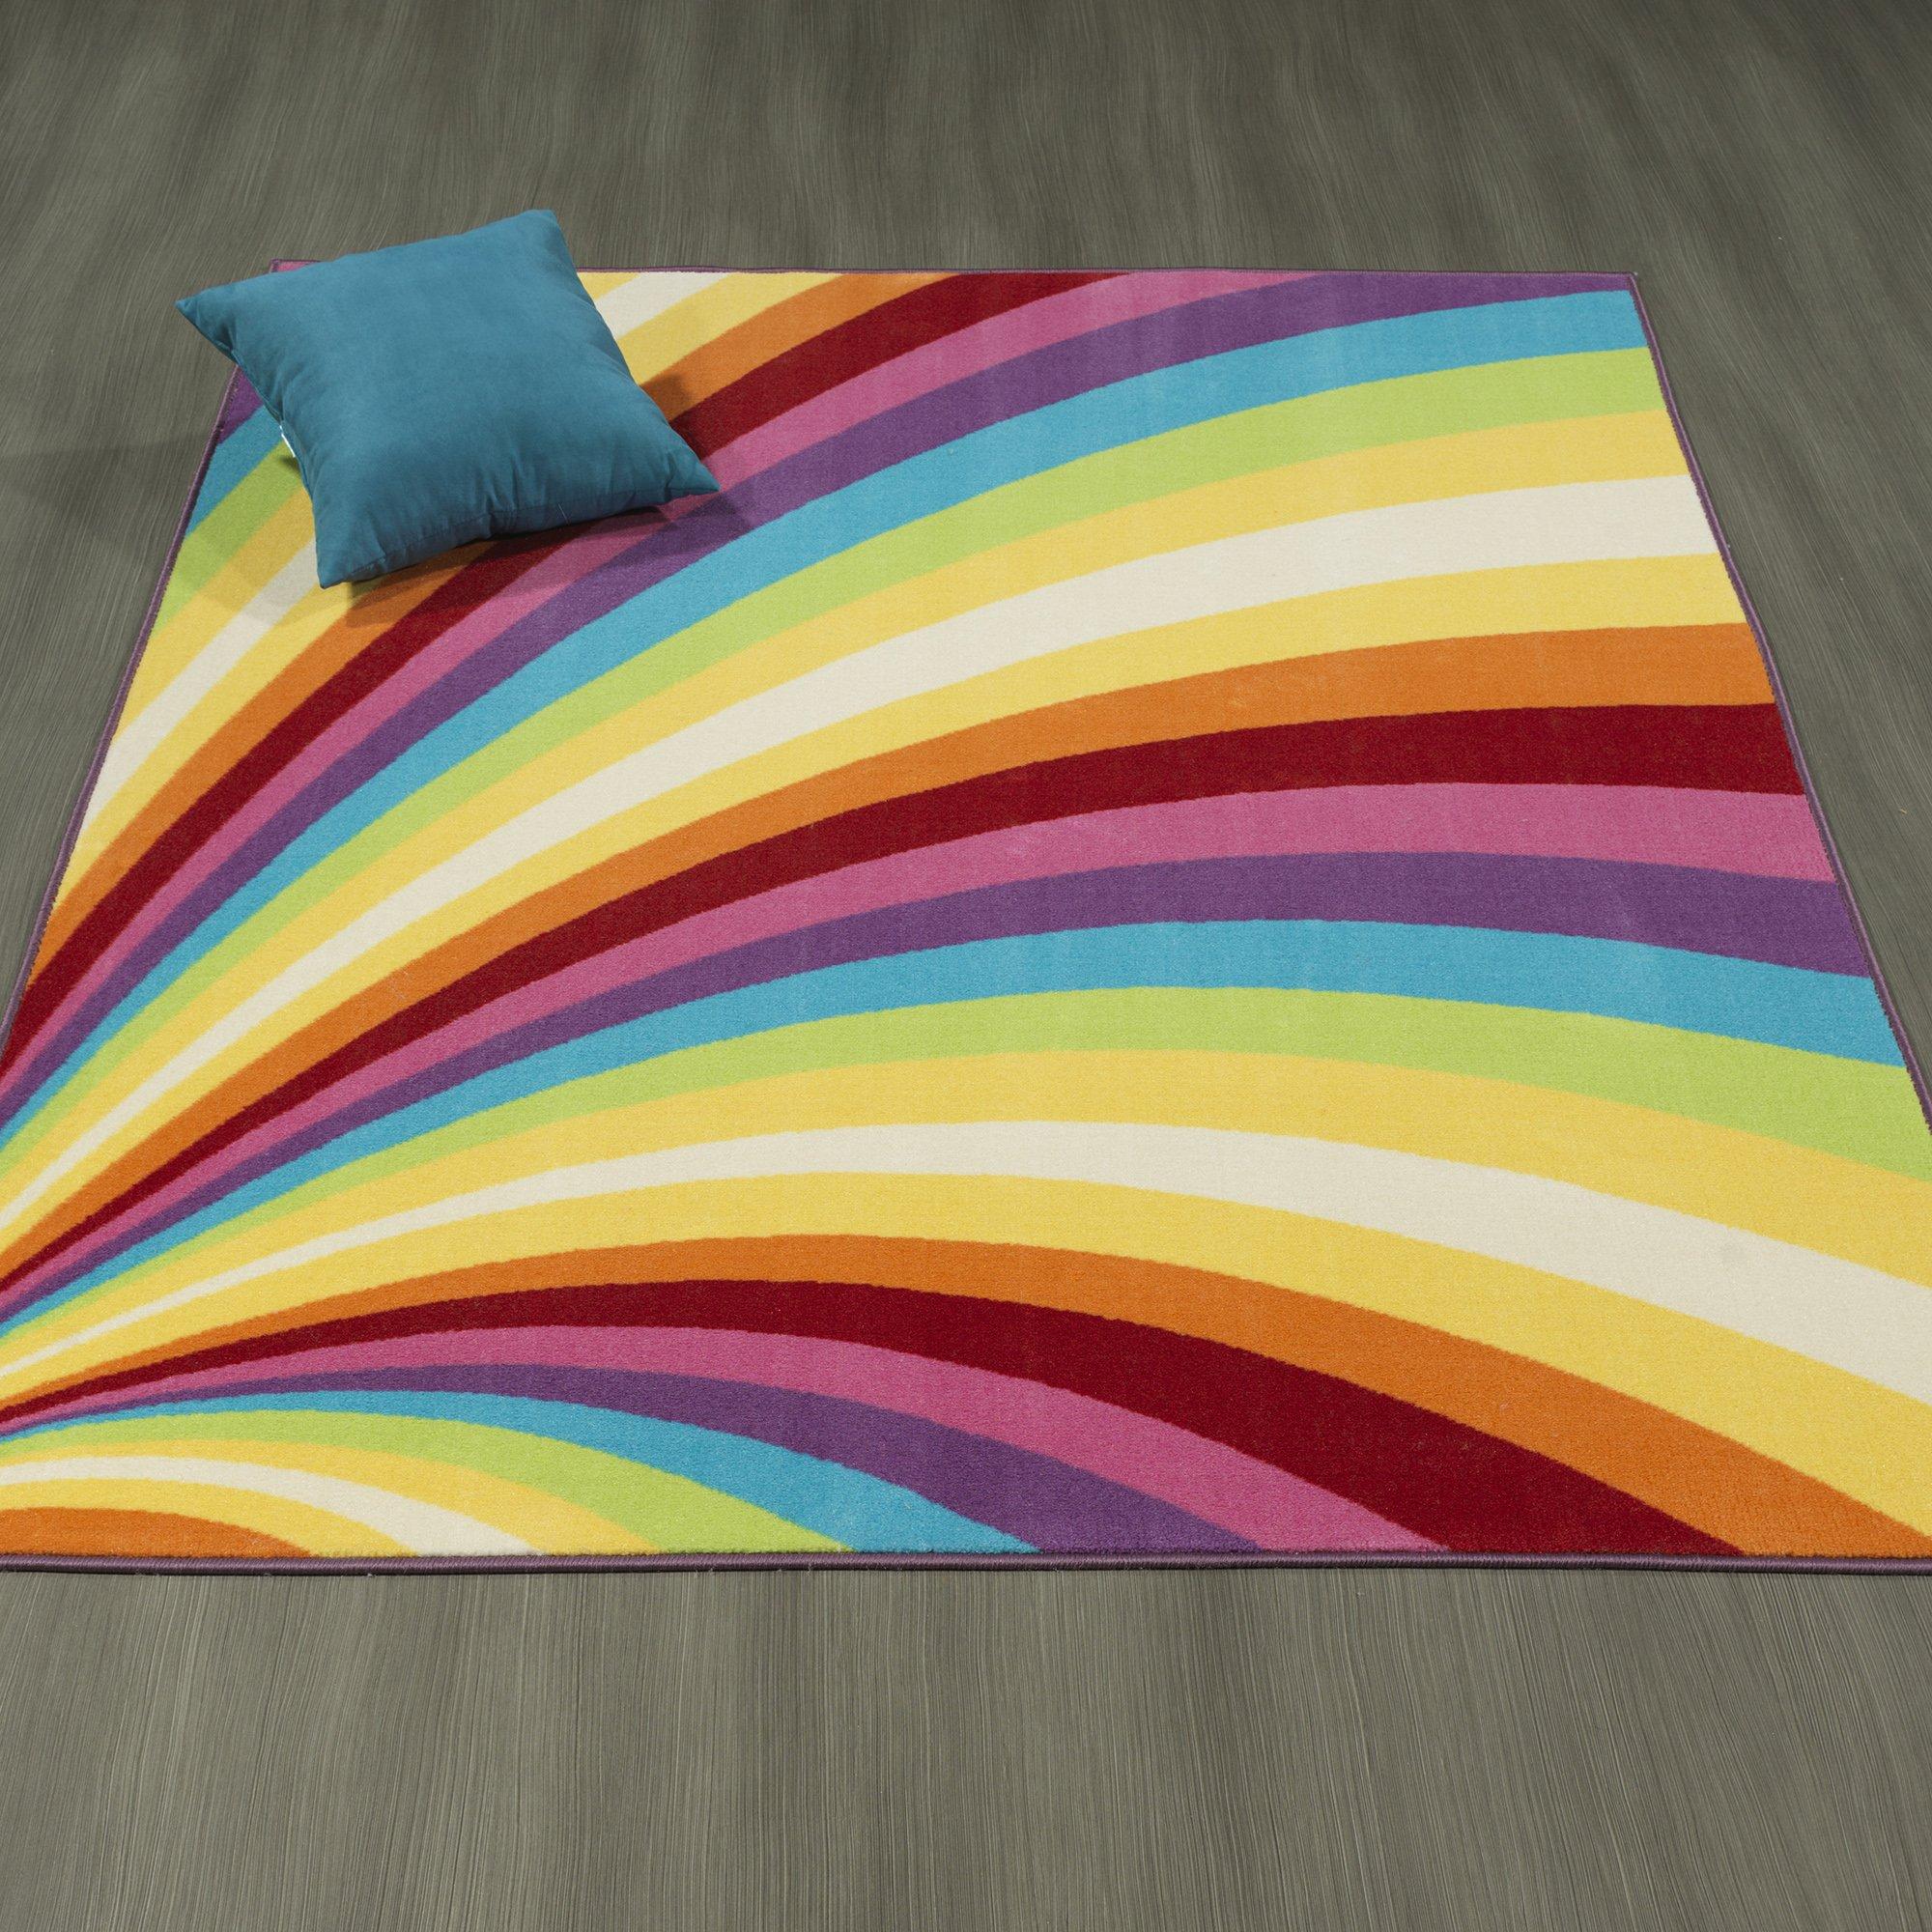 Ottomanson Collection Non-Slip Modern Rainbow Pattern Design Area 98'' x 118'' Kids Rug, 8'2'' X9'10'', Multicolor